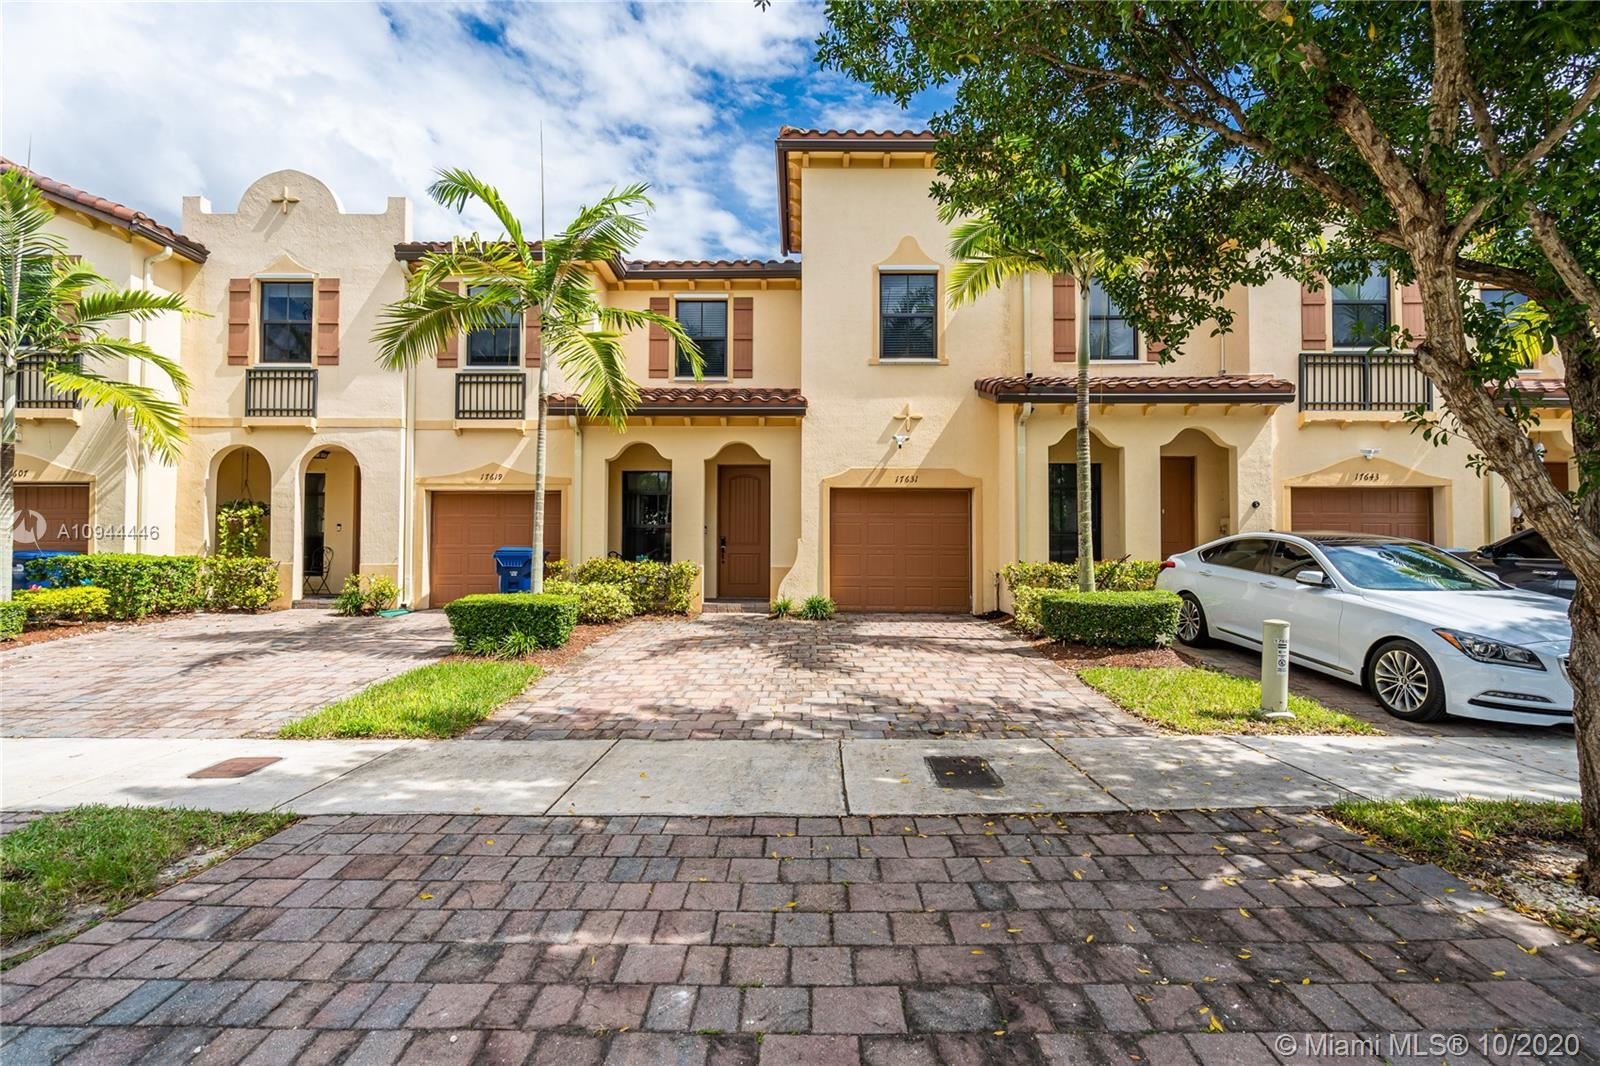 17631 SW 153rd Path, Miami, FL 33187 - #: A10944446